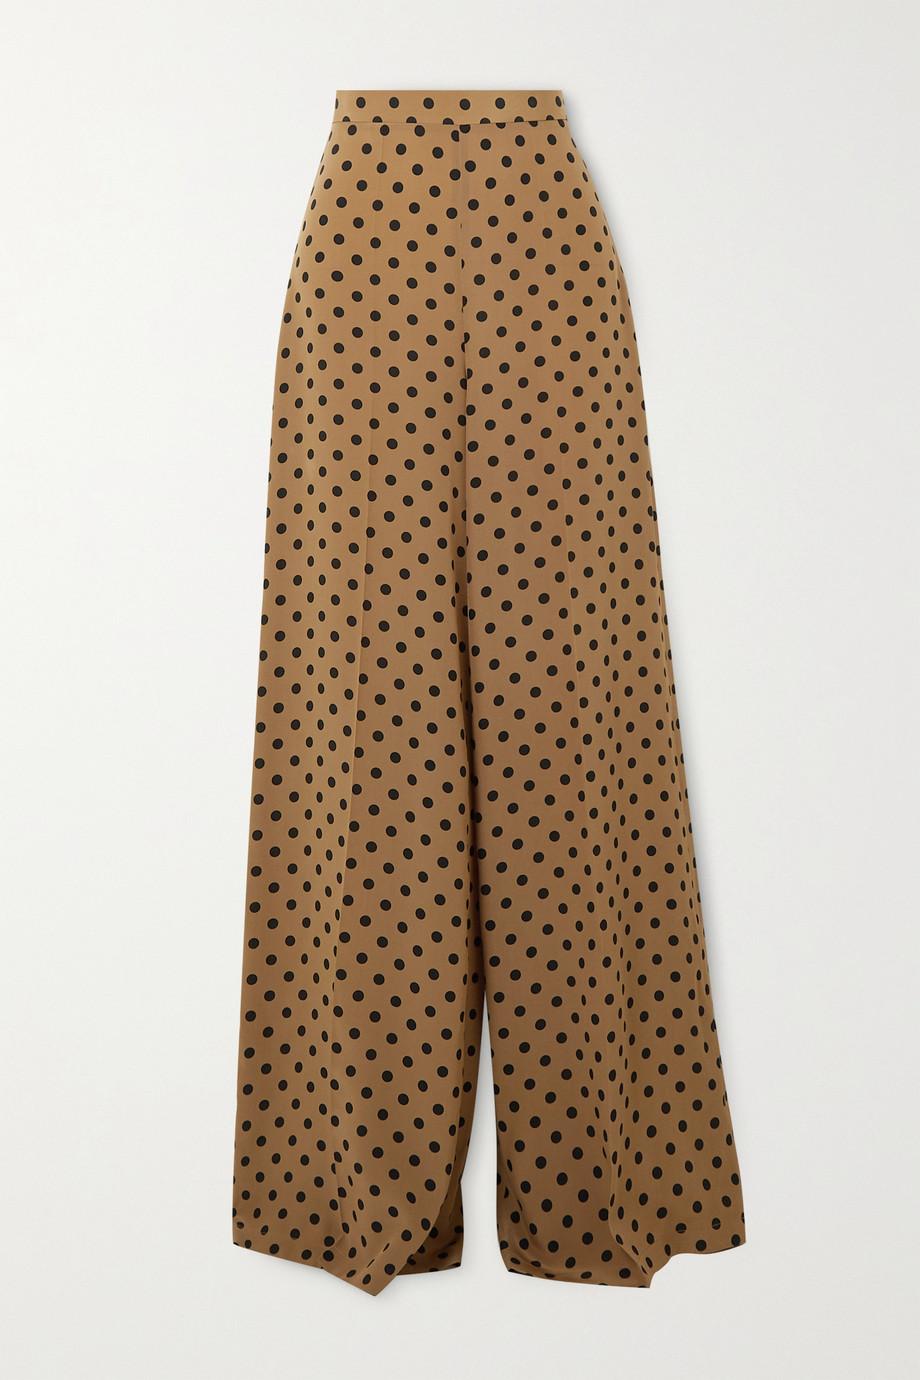 Michael Kors Collection Polka-dot silk crepe de chine wide-leg pants